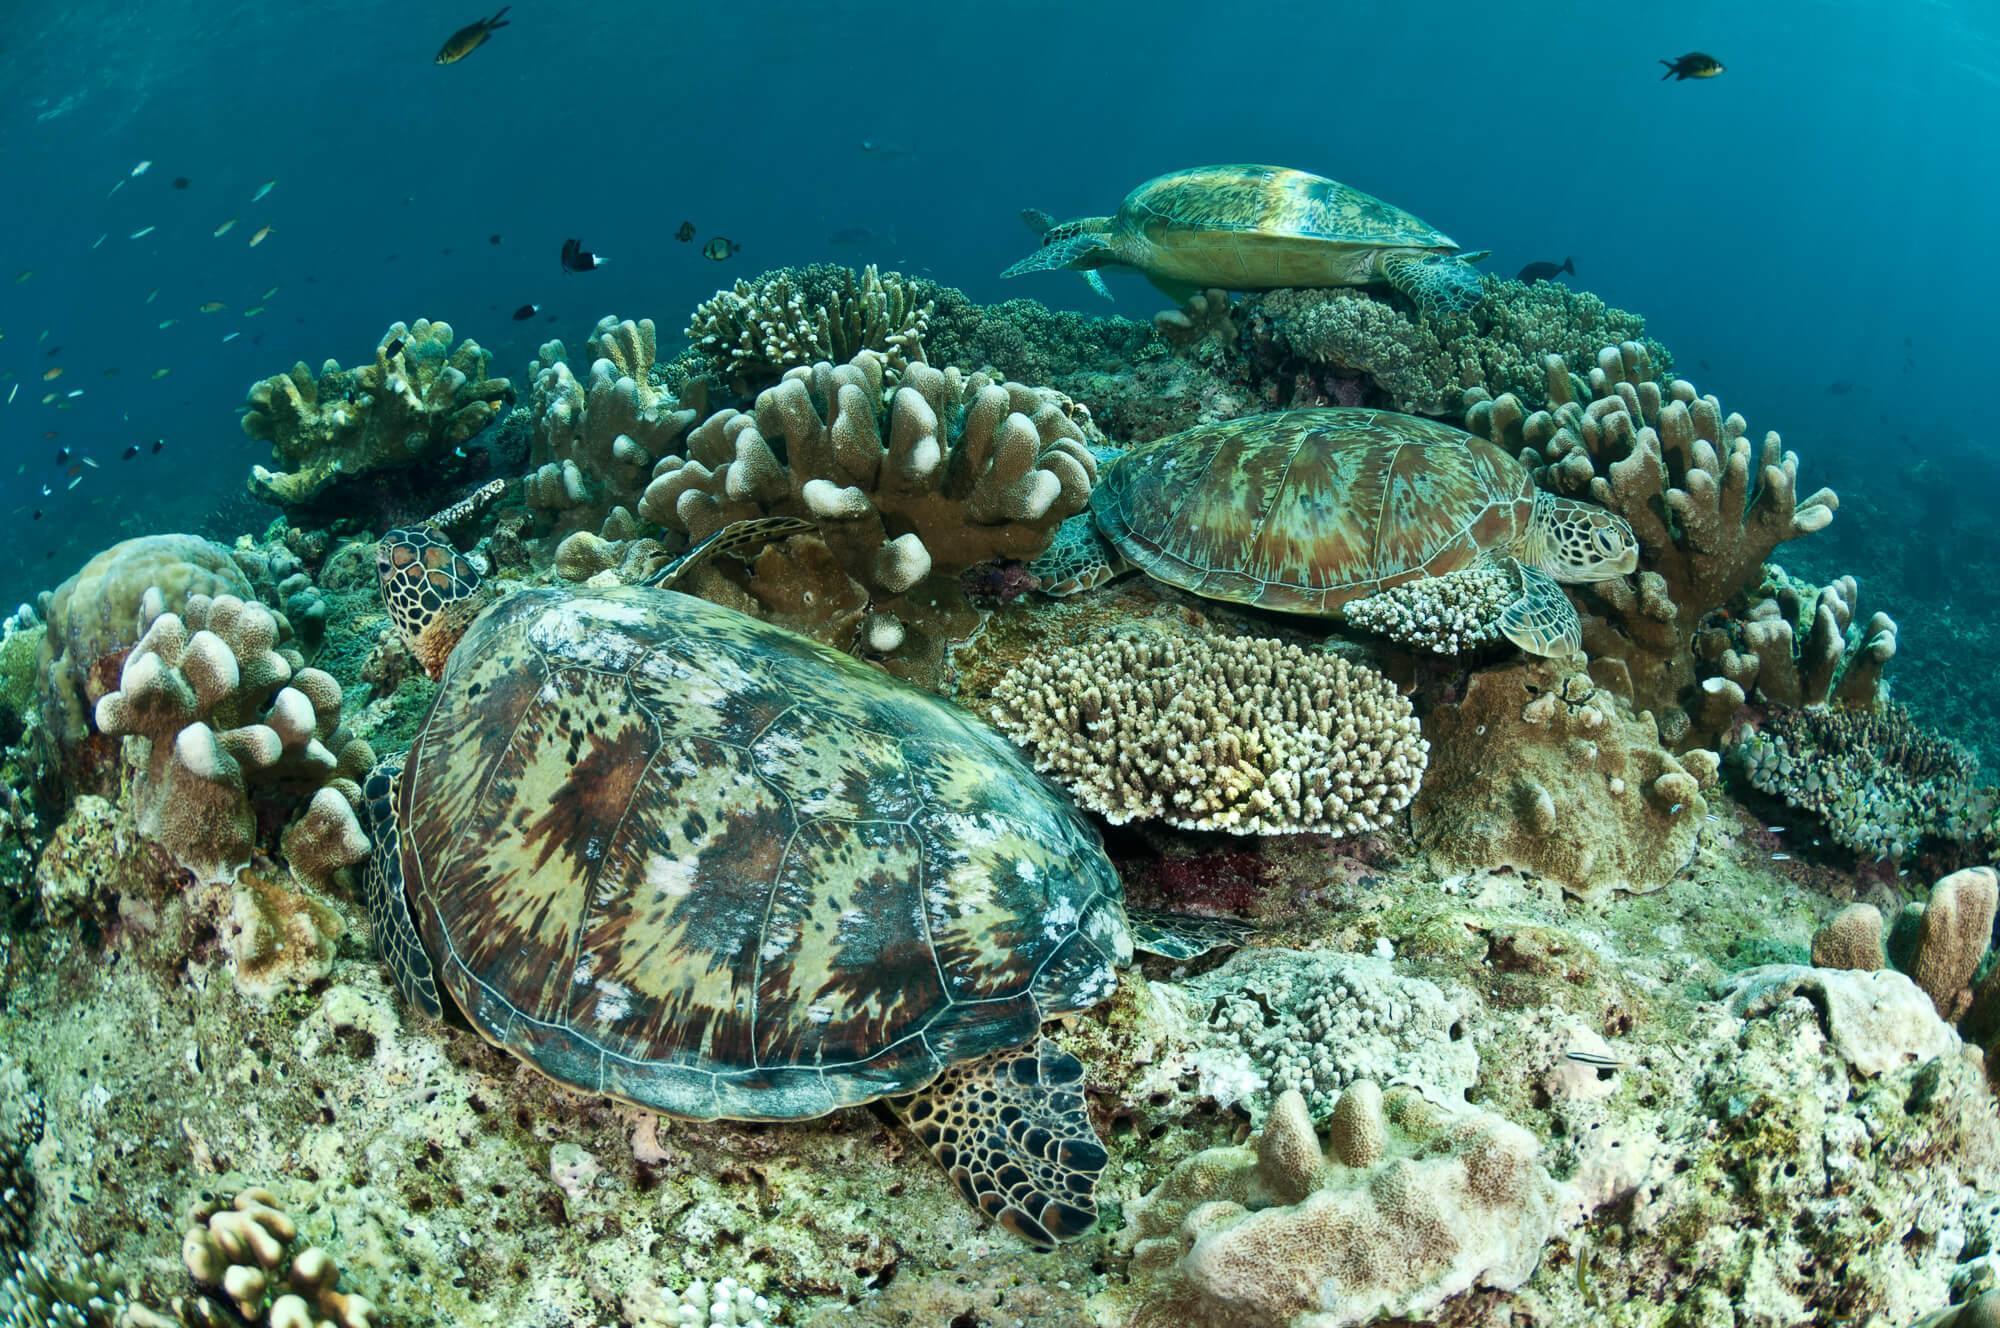 Sabah_Sipadan_Turtles.jpg#asset:2950